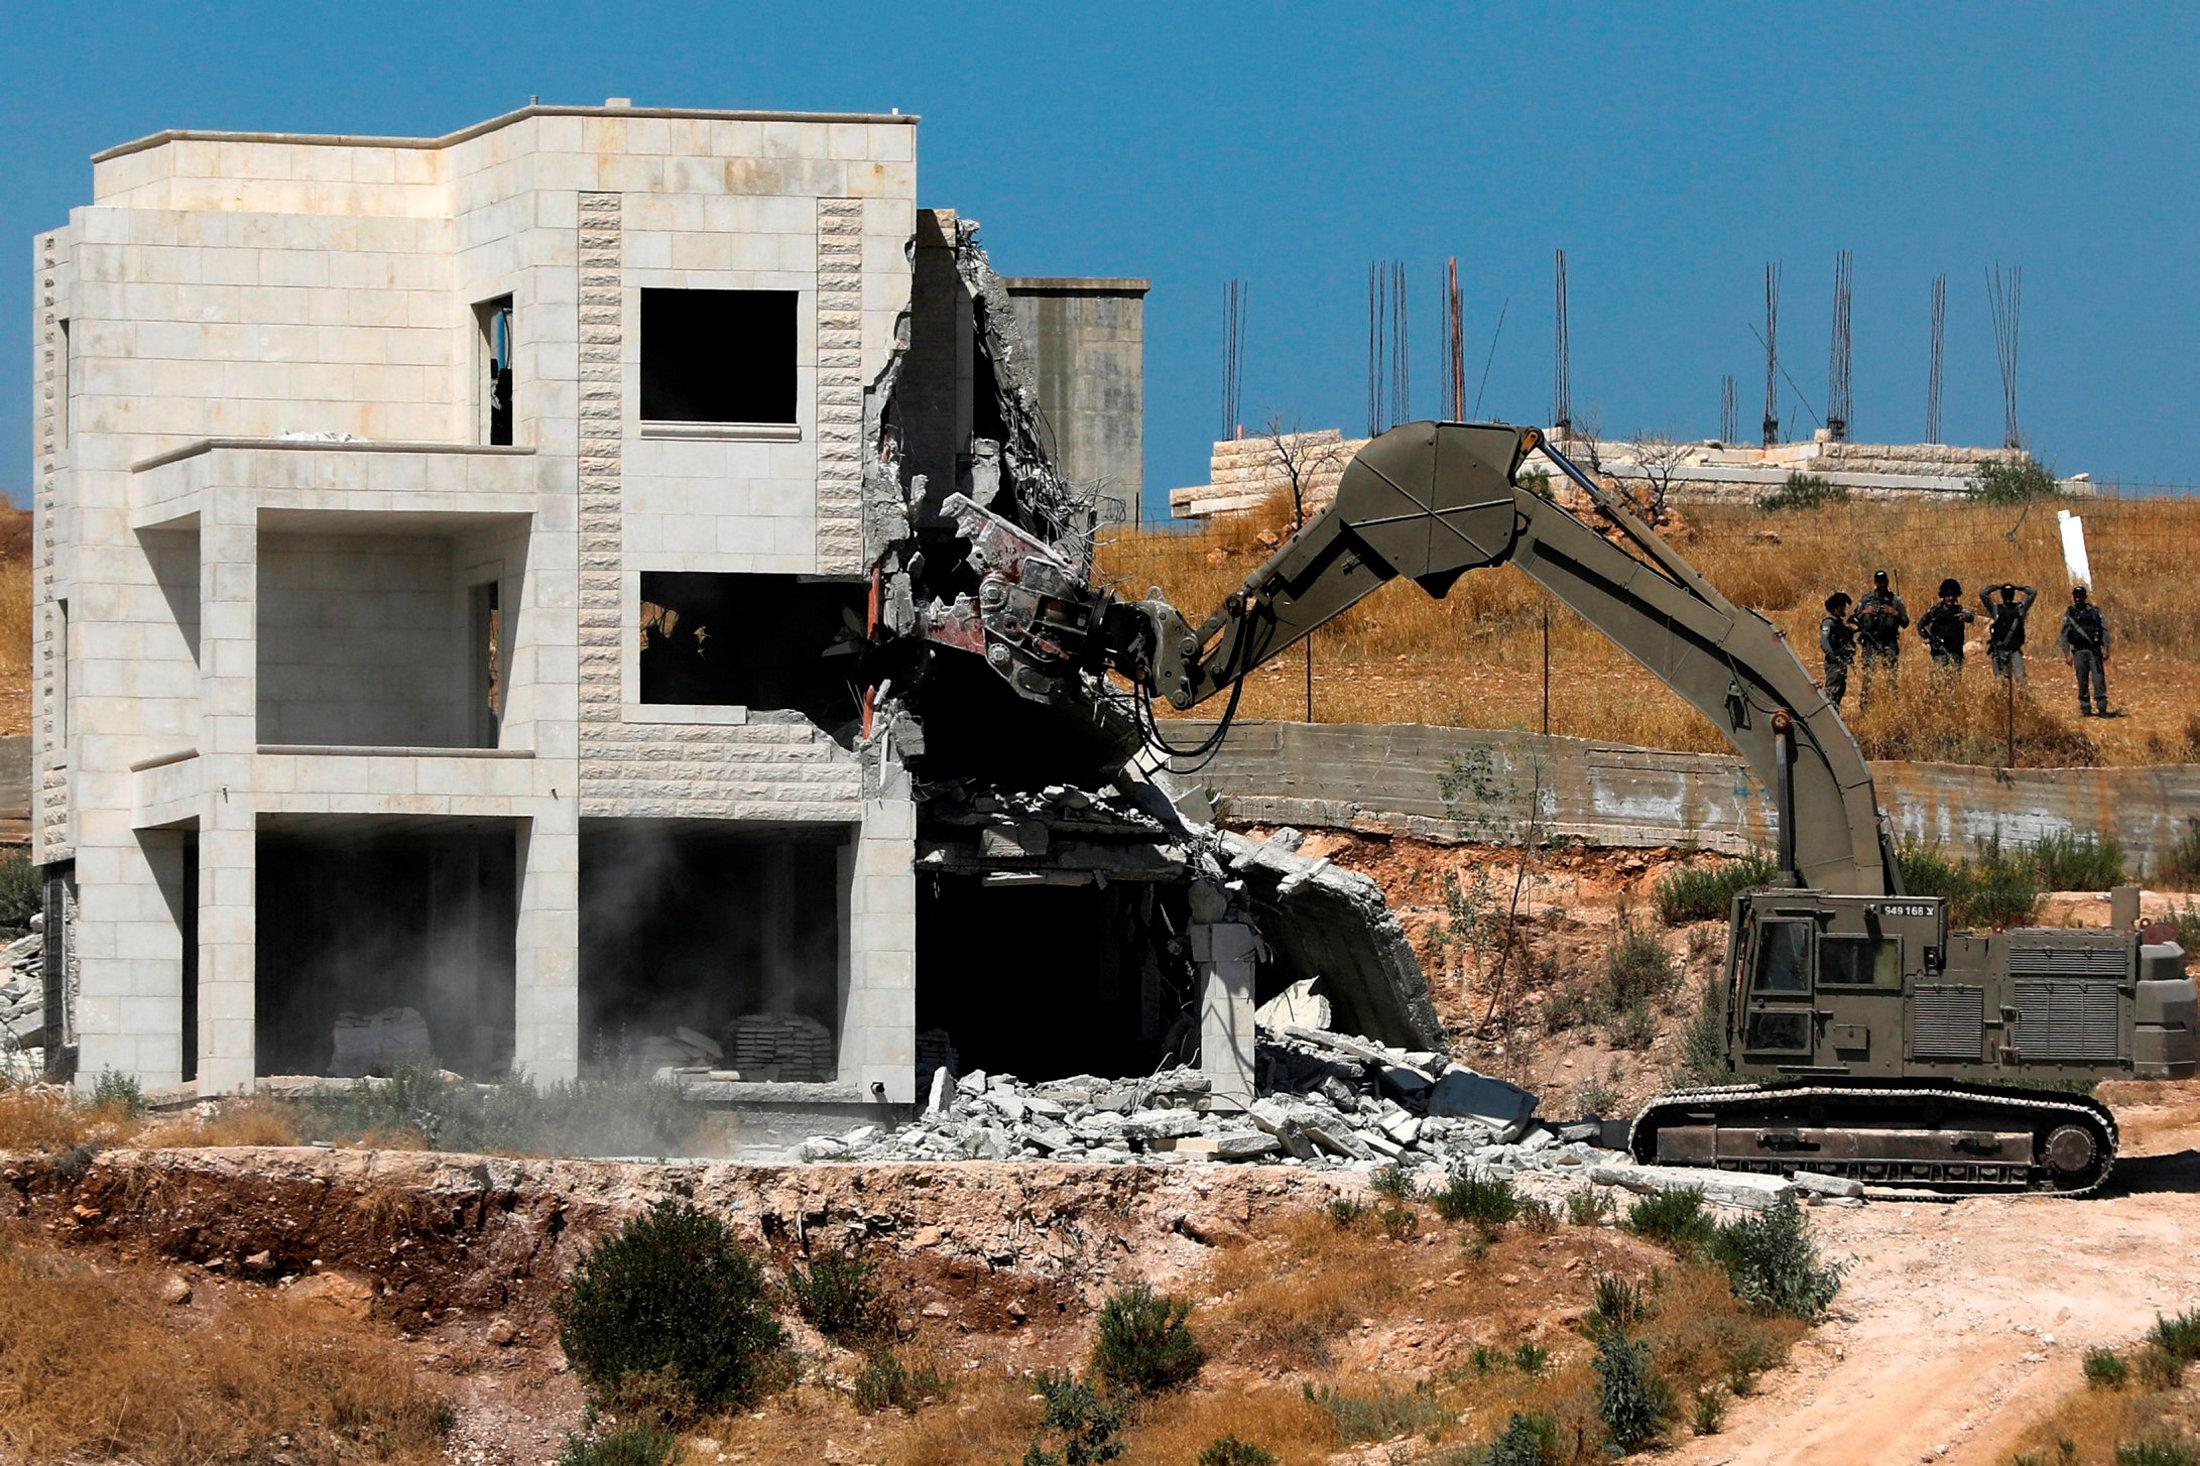 Israel to demolish 30 Palestinian houses in an East Jerusalem neighborhood